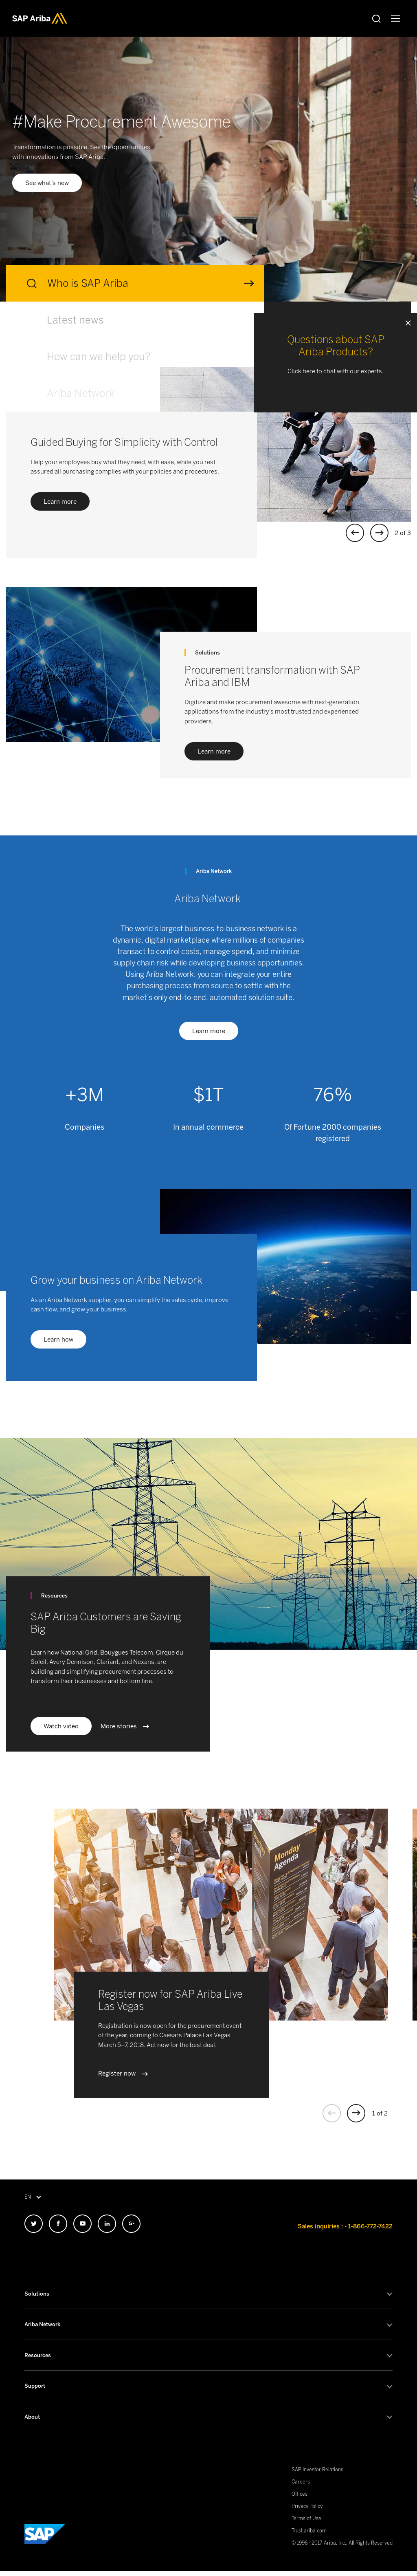 Ariba Competitors, Revenue and Employees - Owler Company Profile